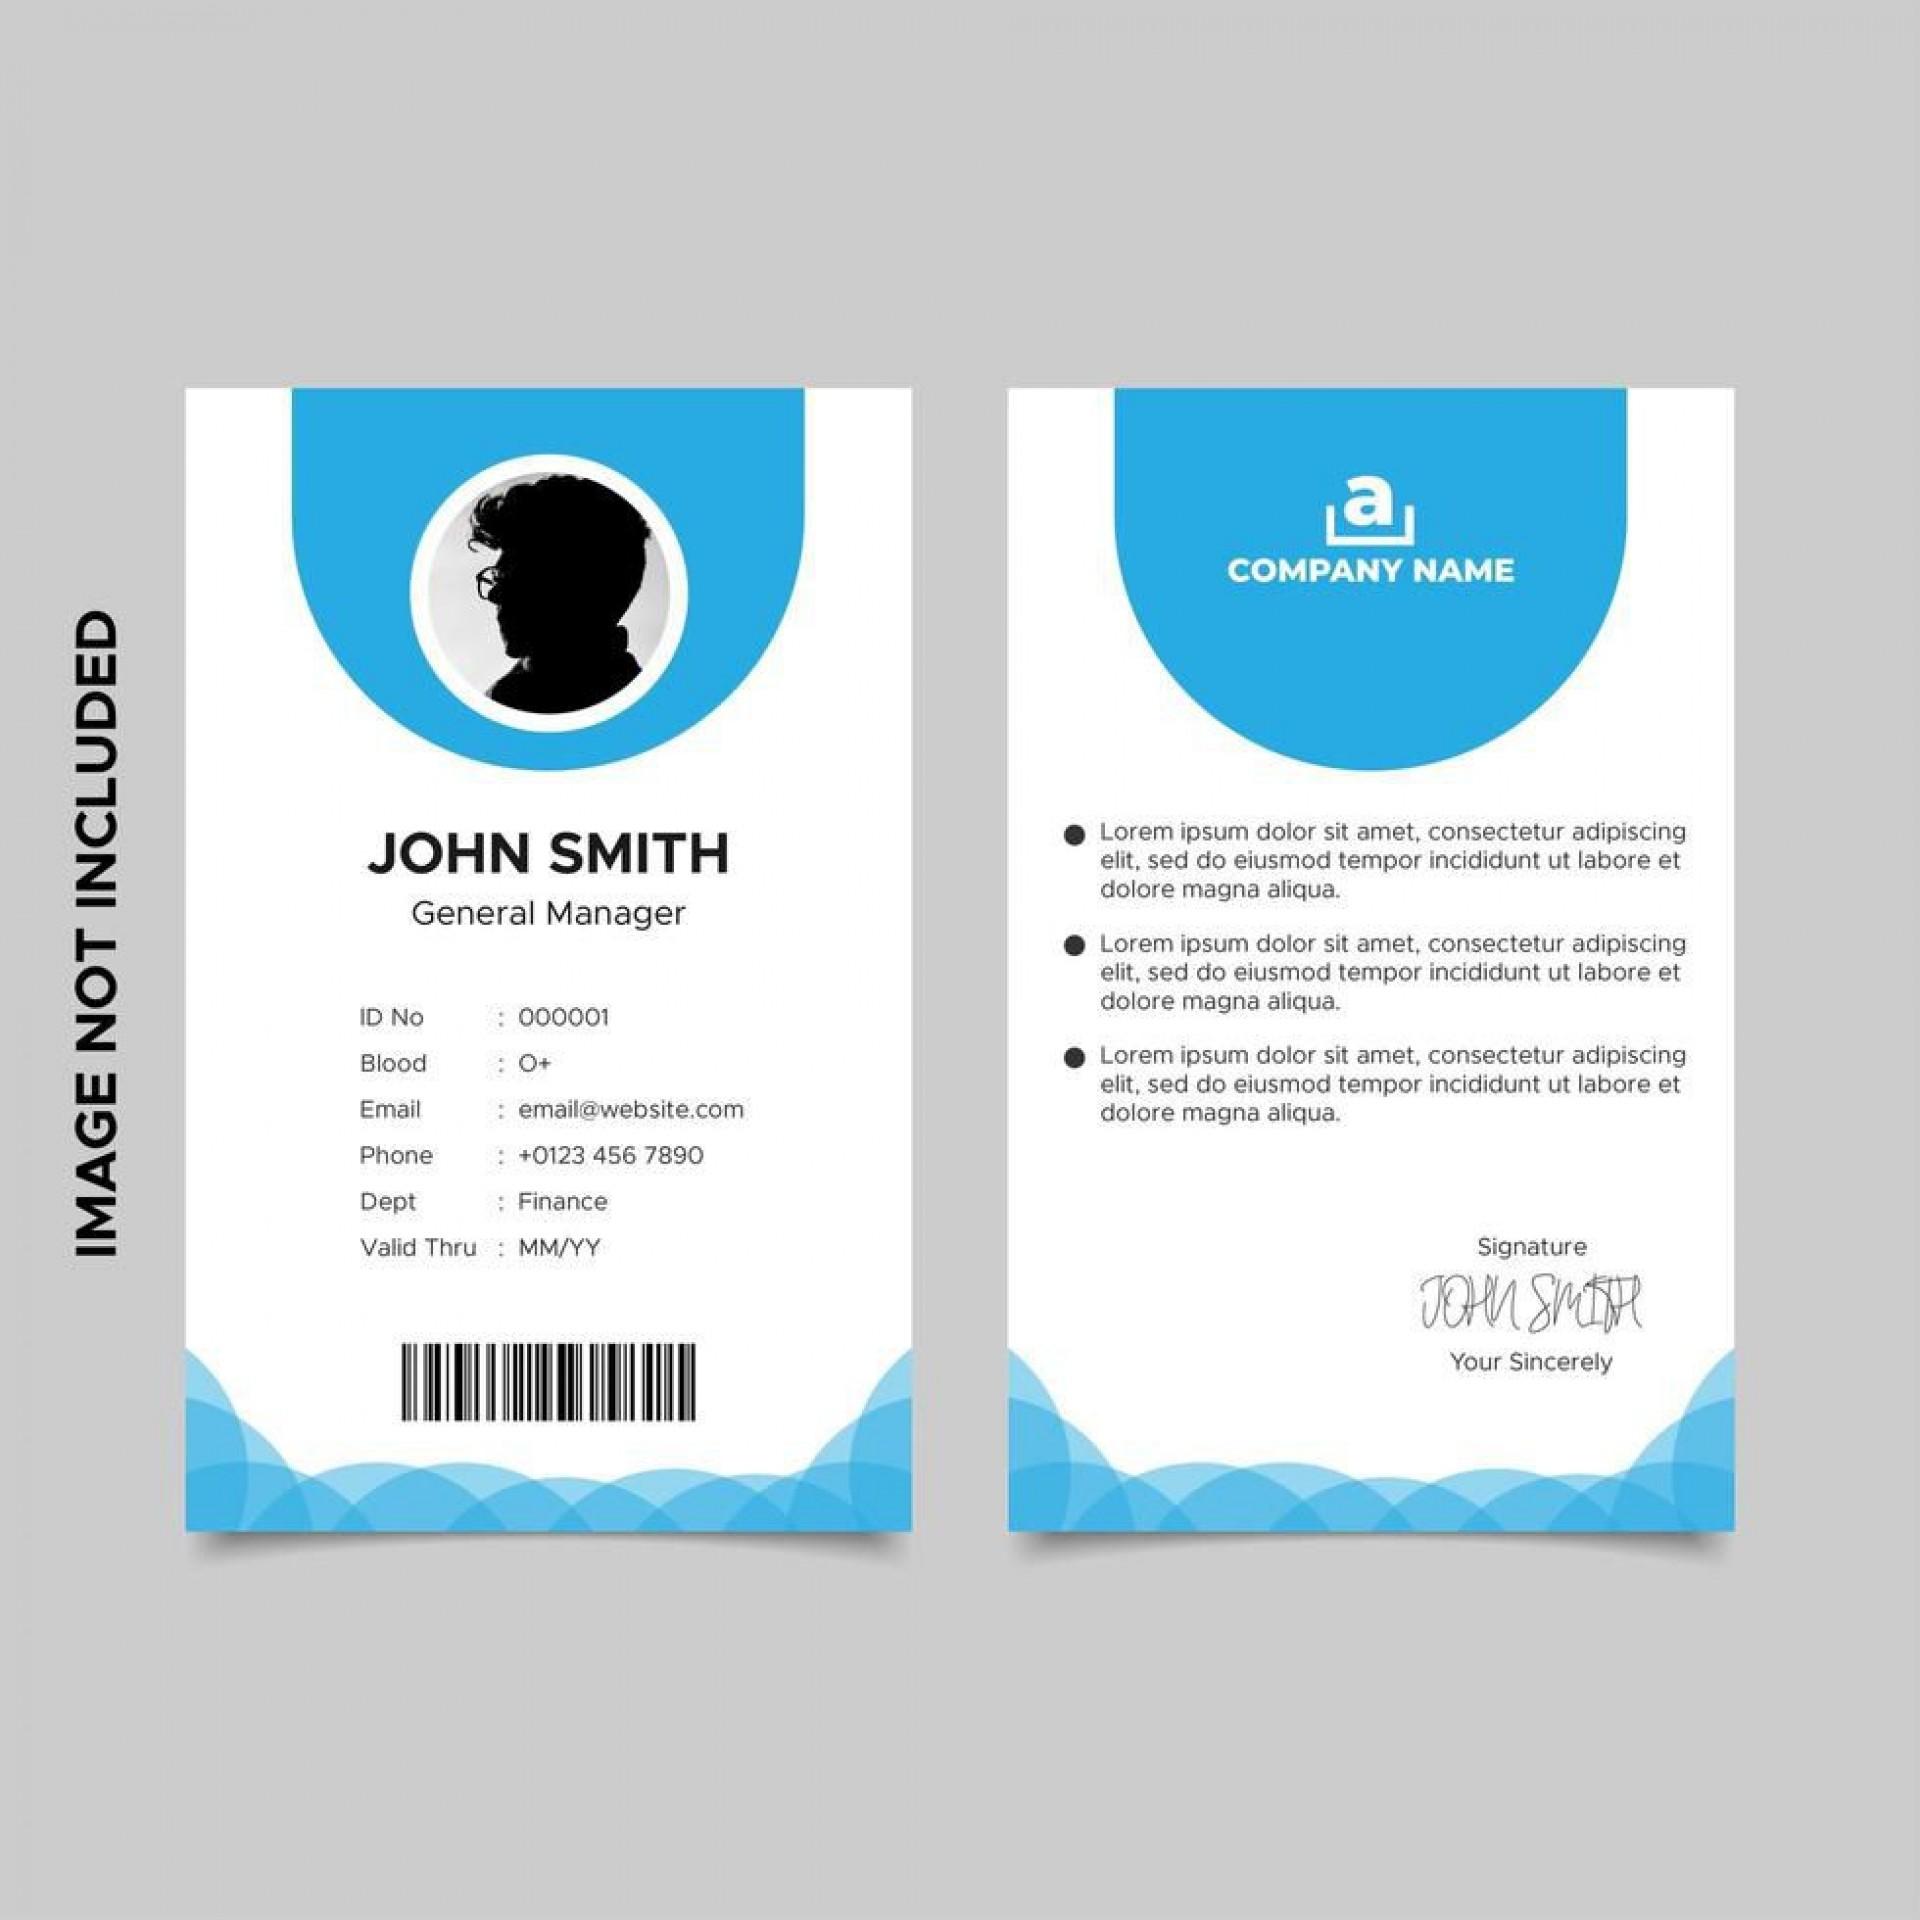 007 Stirring Id Card Template Free Inspiration  Download Pdf Design1920